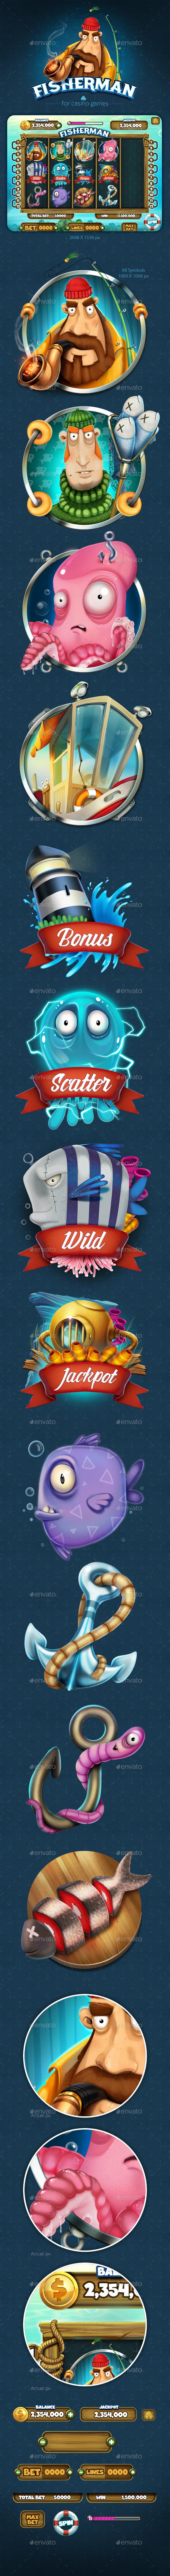 Fisherman Slot Game for Mobile Platforms - Game Kits Game Assets